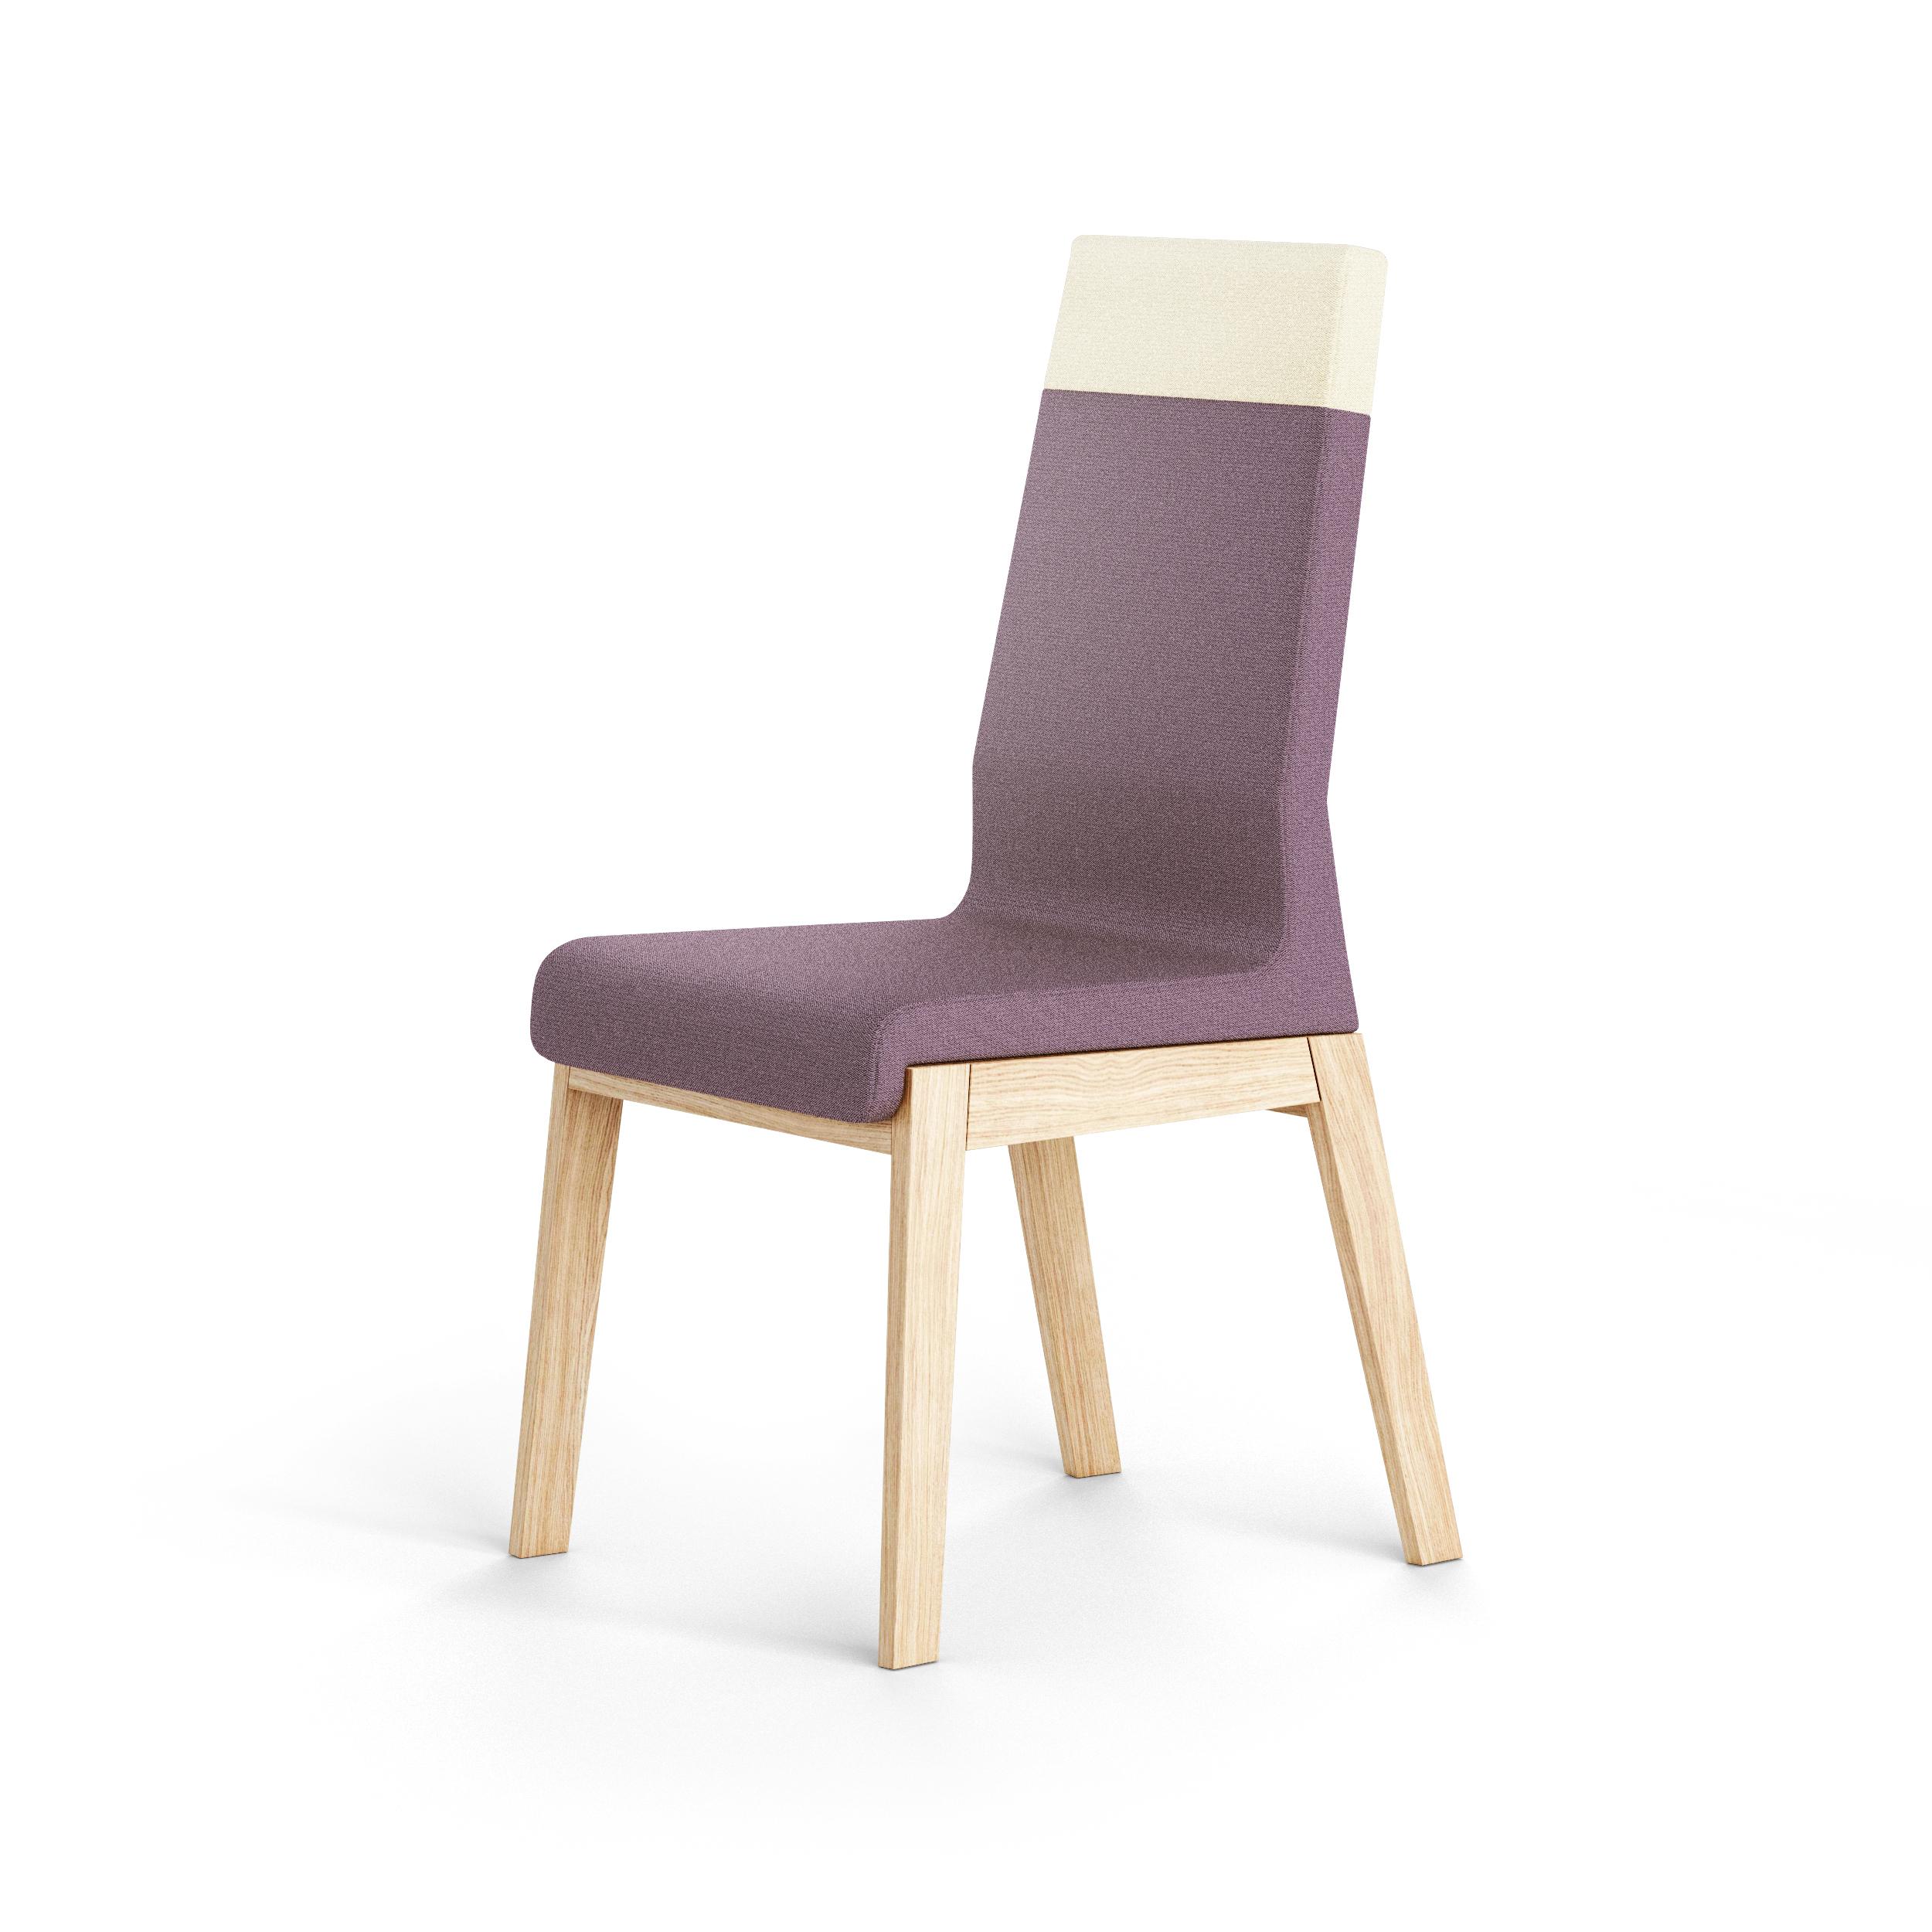 Scaun Kyla High Purple/Beige